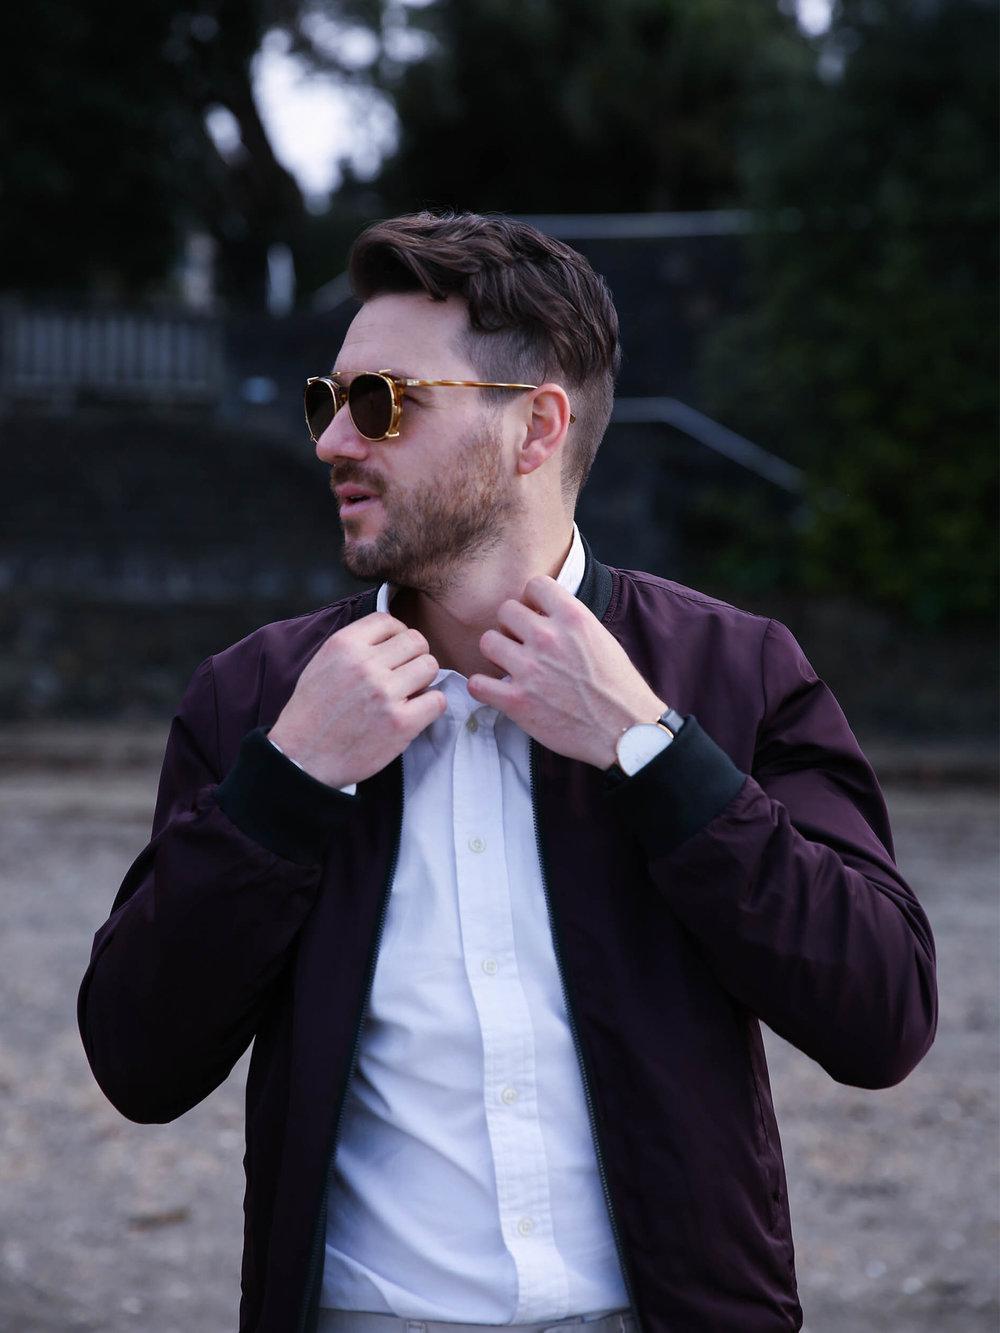 wells_bailey_nelson_jaheb_barnett_mens_fashion_blogger_new_zealand